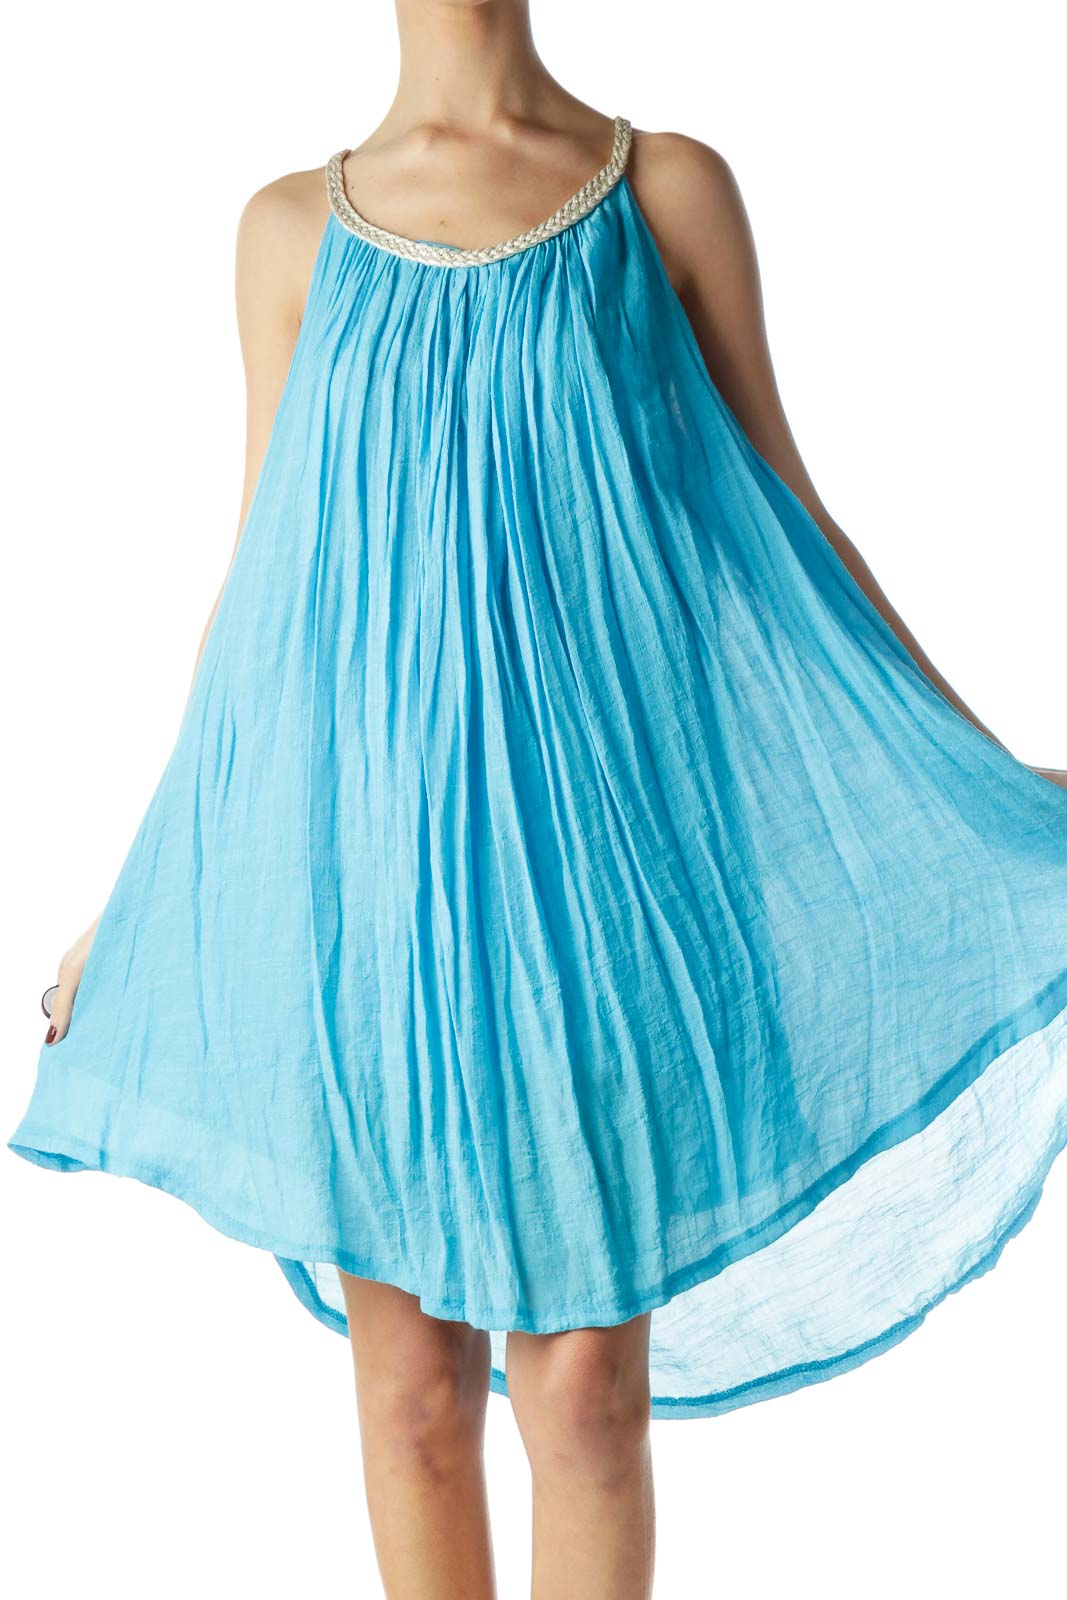 Turquoise Blue Halter Neckline Flared Dress Front